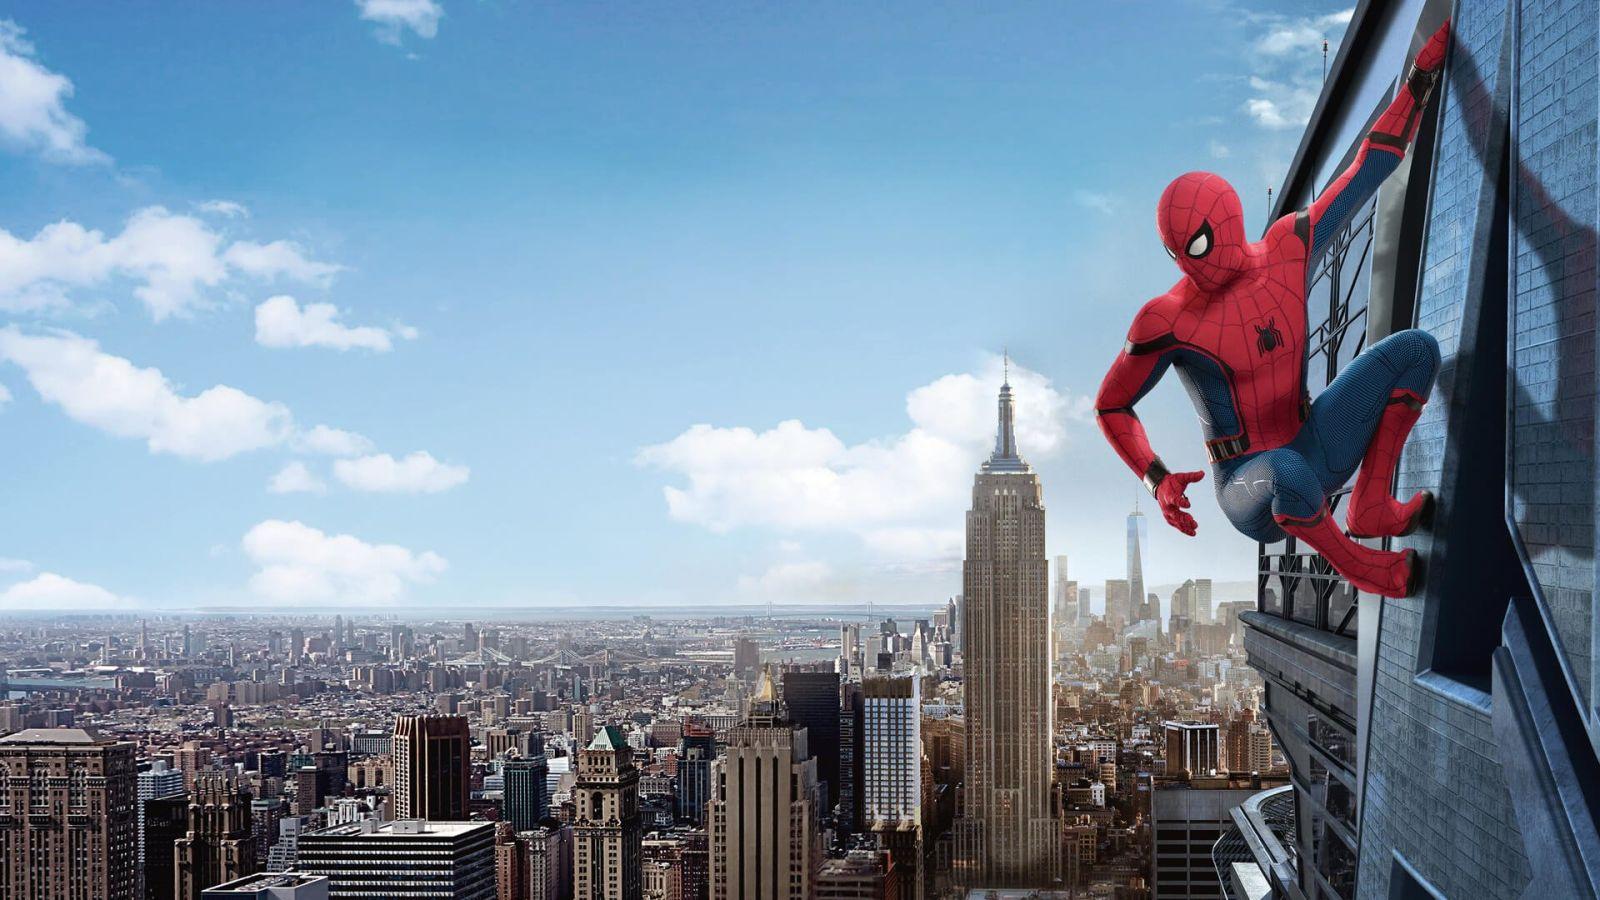 i77t9cbdugubg3lt1lam1 Spider-Man: Homecoming